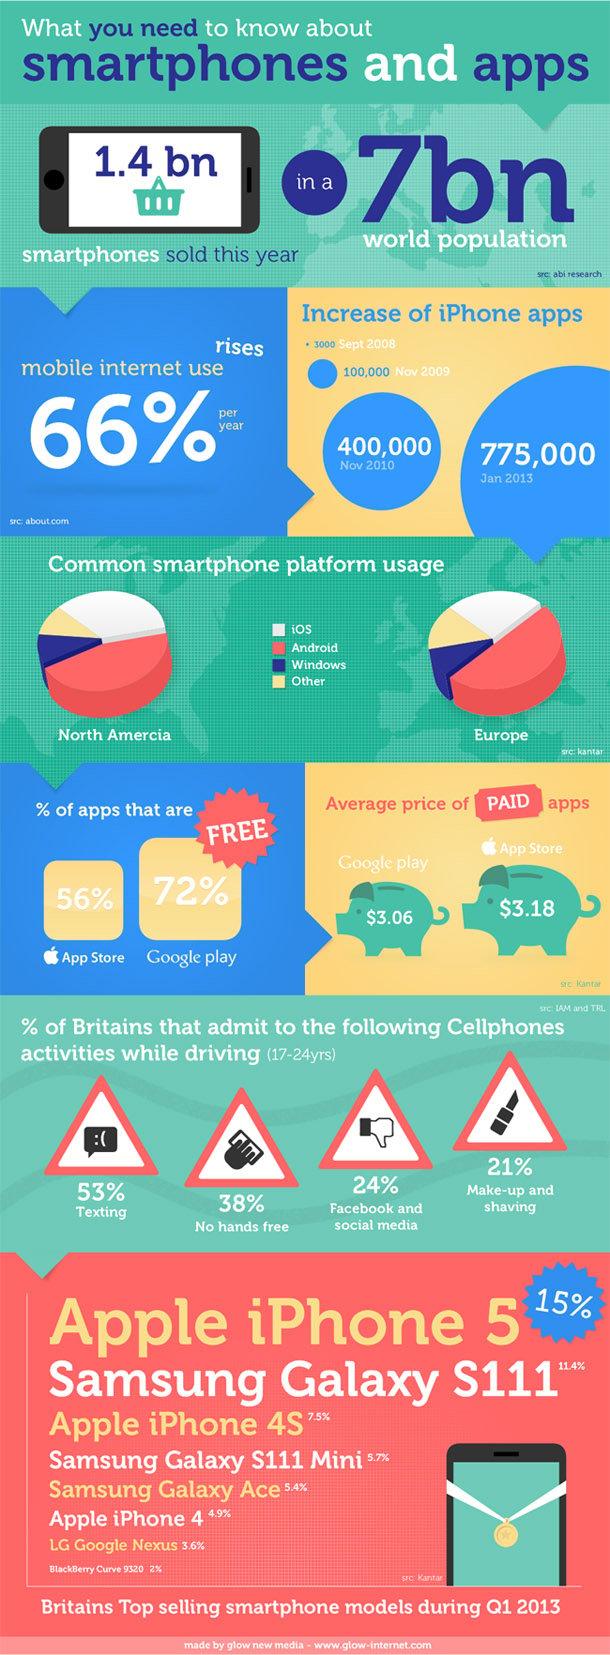 Smartphone figures, behavior and more